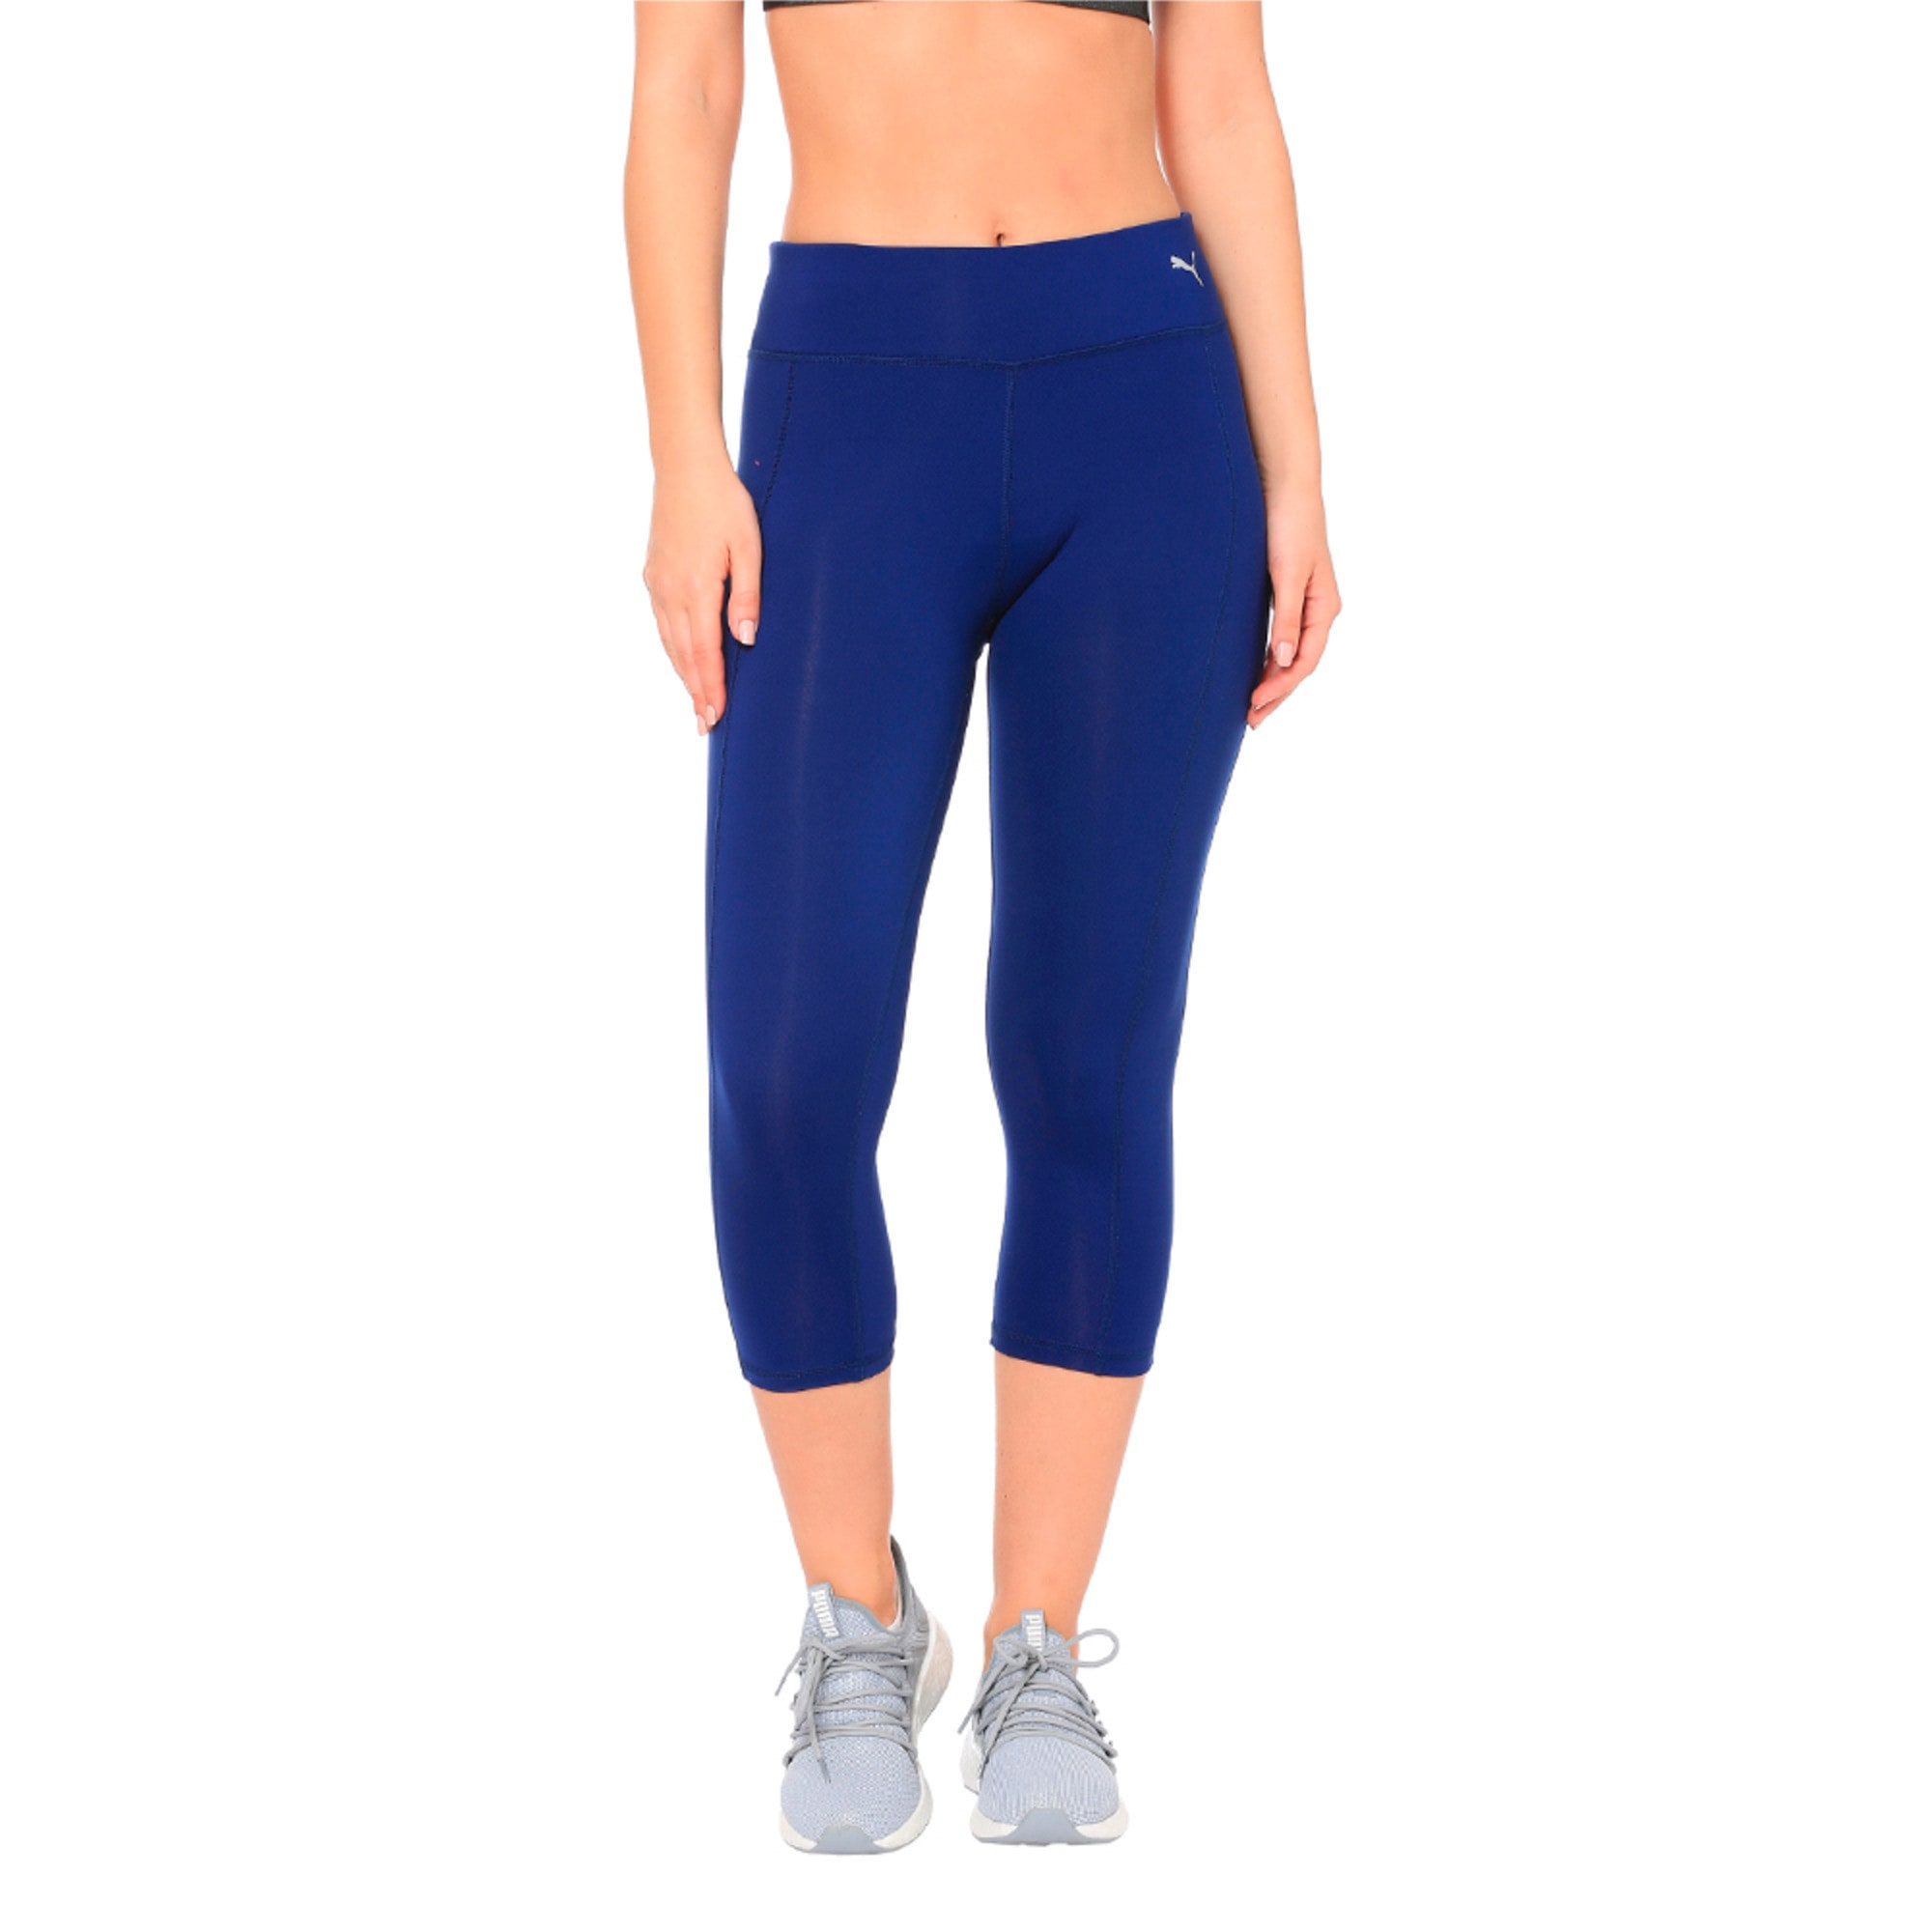 Thumbnail 3 of Training Women's Essential 3/4 Tights, Blue Depths, medium-IND